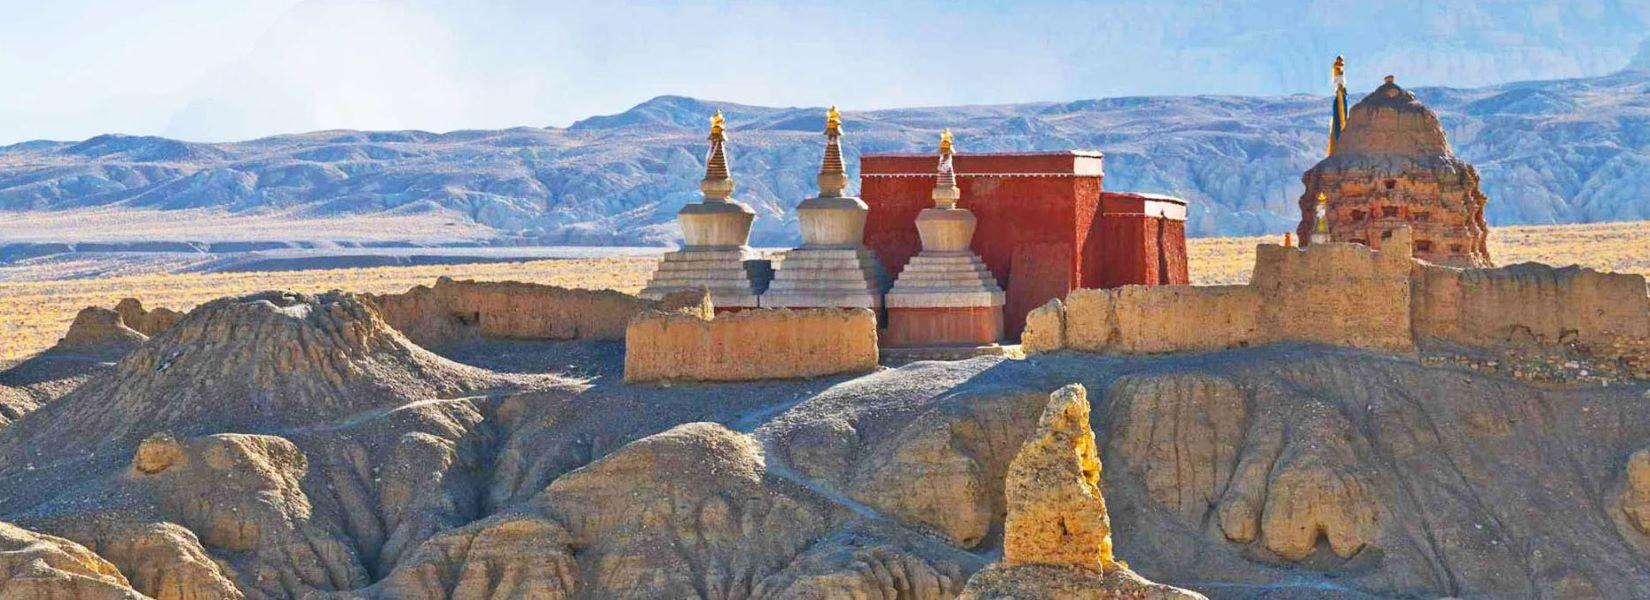 Mt. Kailash and Guge Kingdom